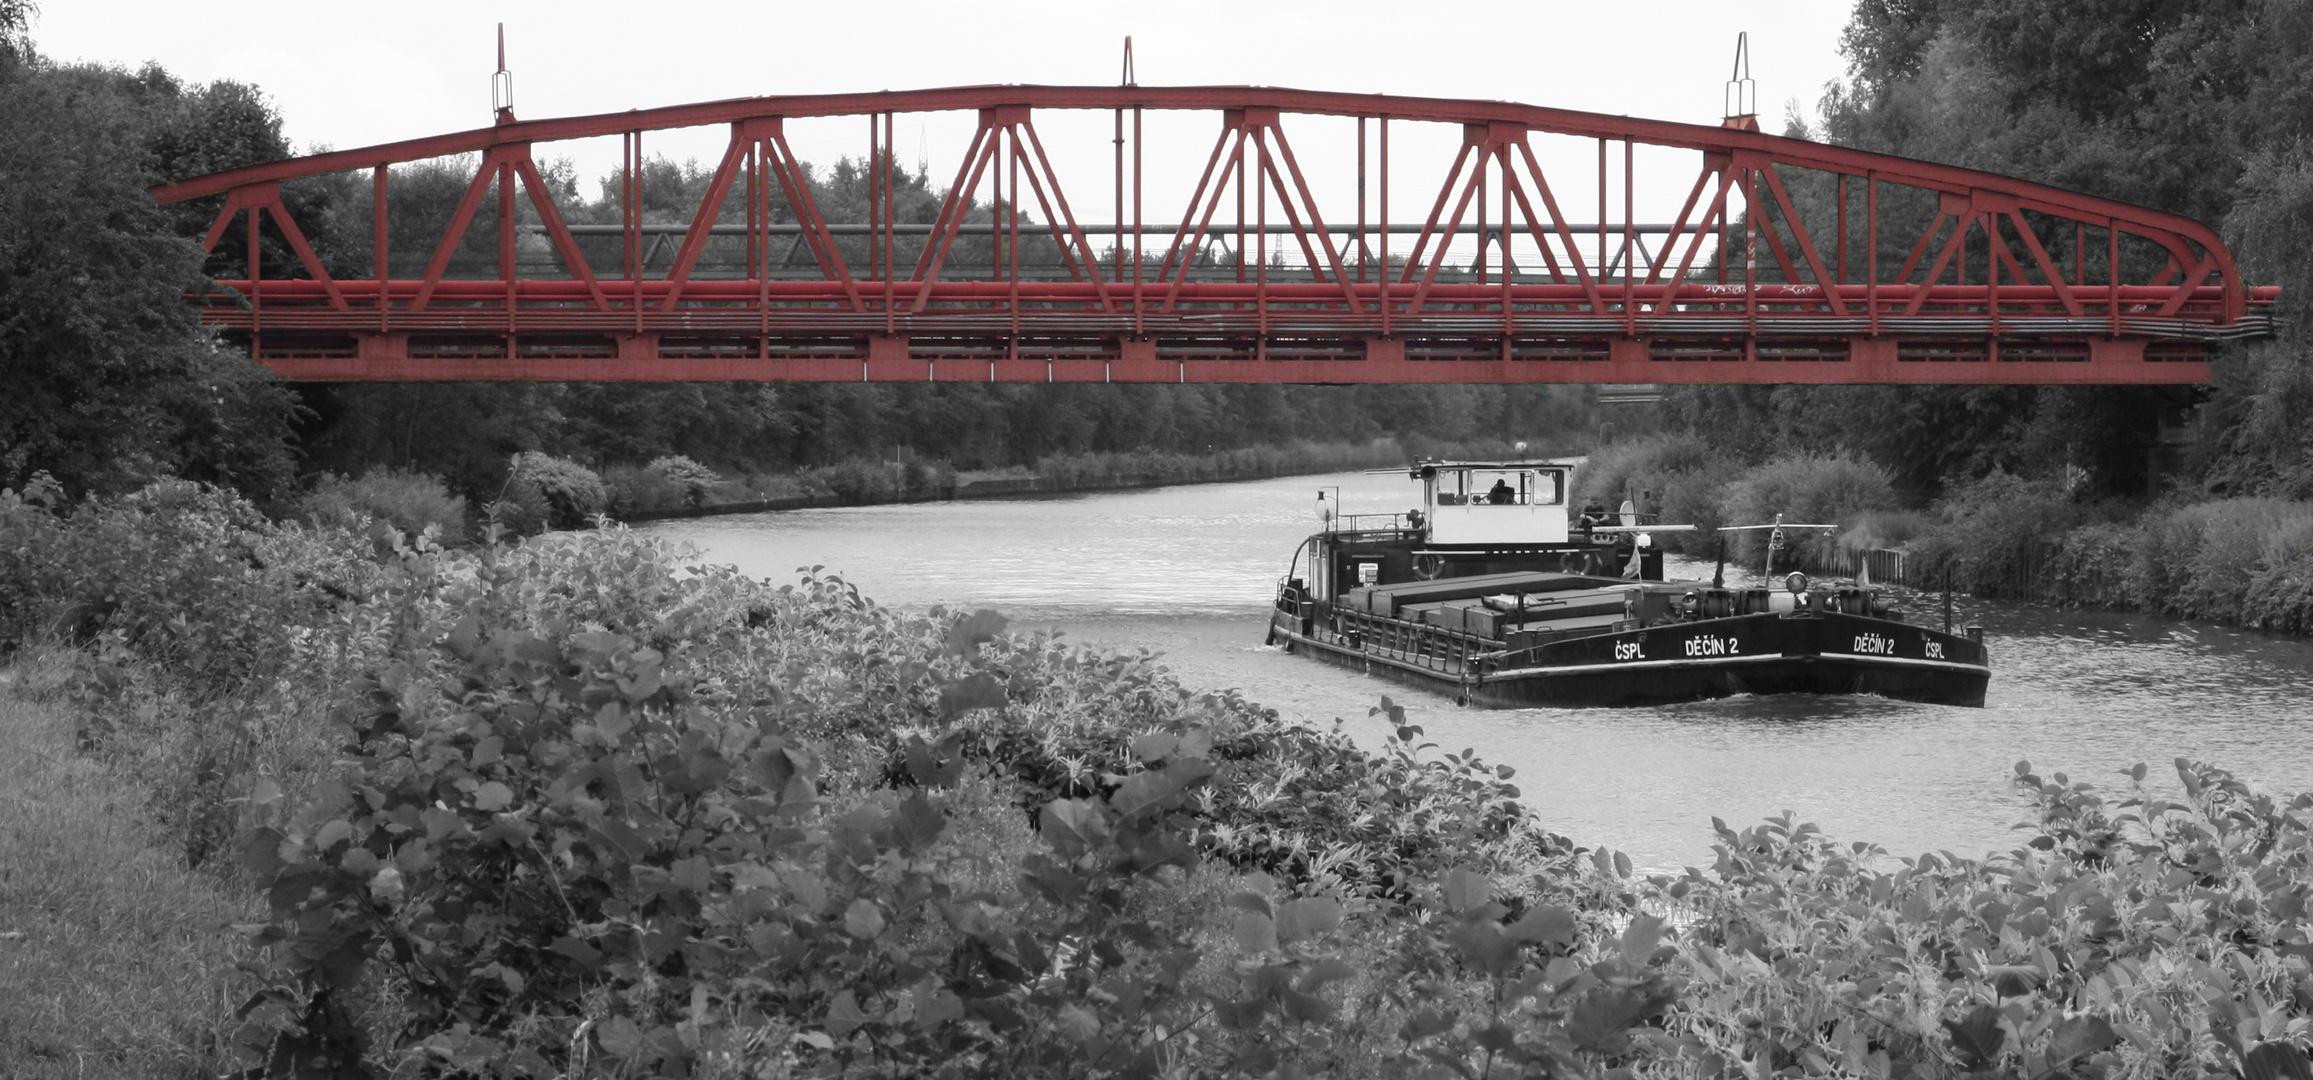 Kanalbrücke am Rhein Herne Kanal, nähe Buga